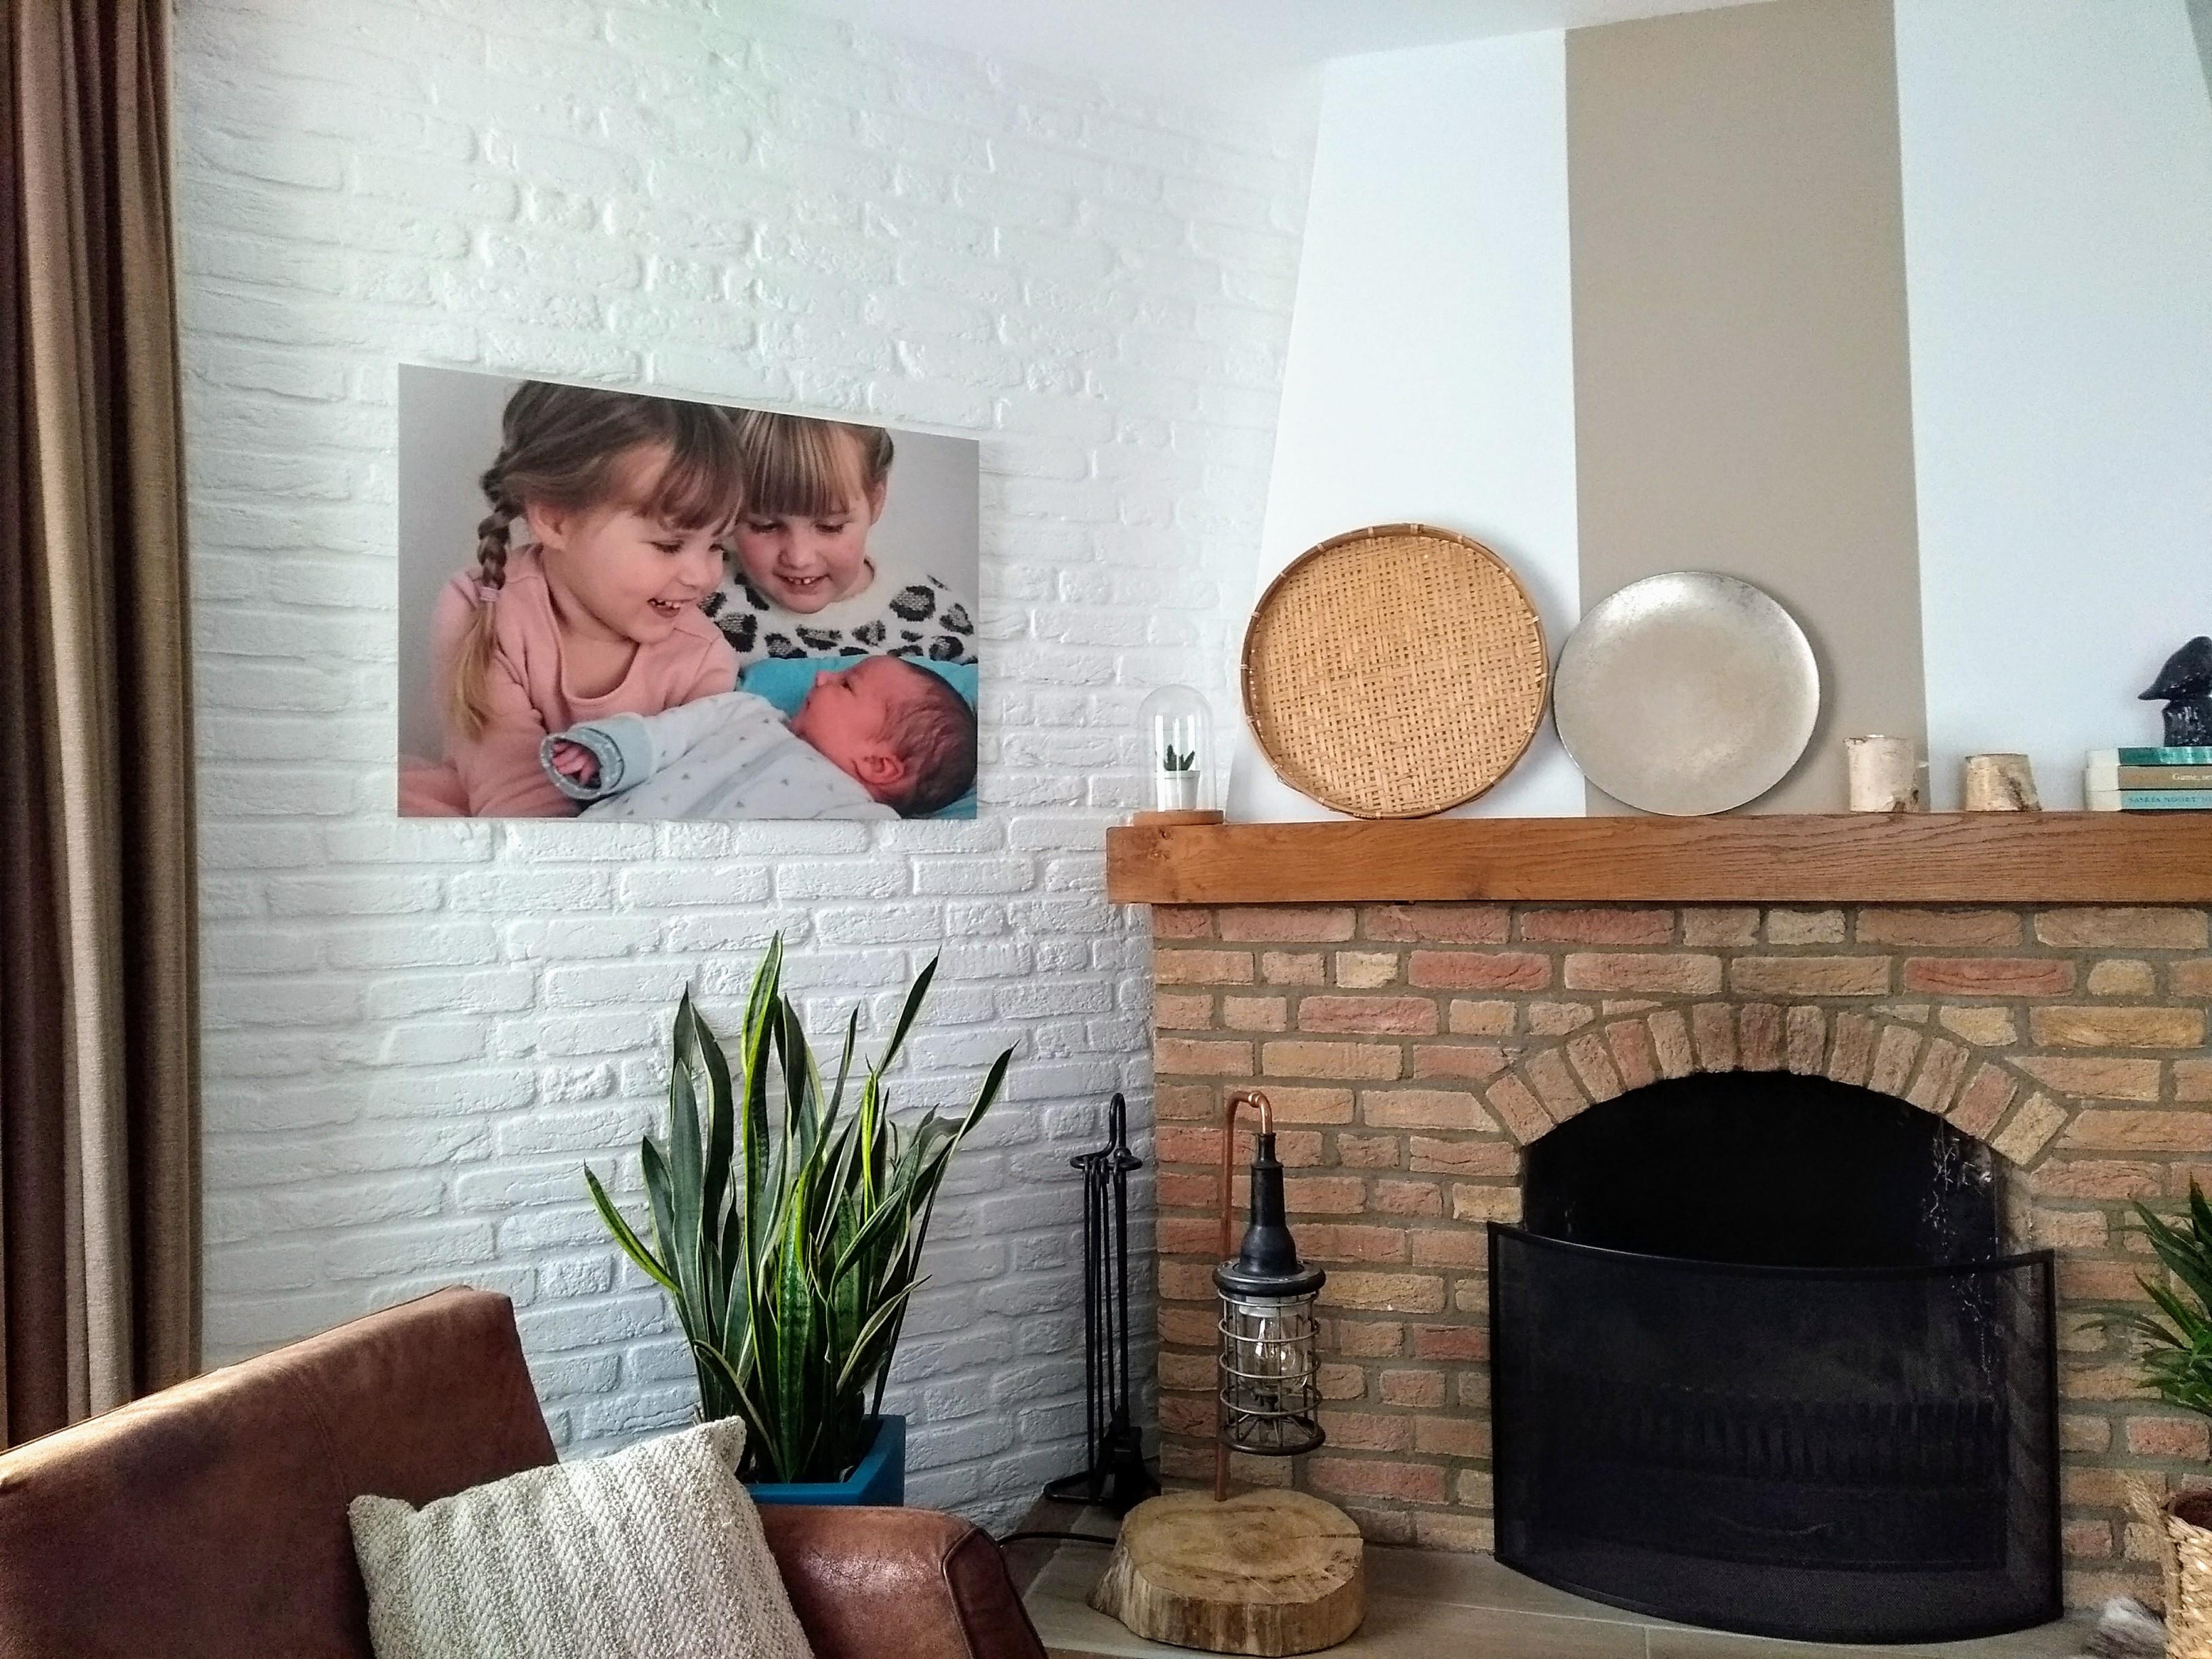 wanddecoratie, foto, forex, muur, interieur, foto afdrukken, drukwerk, drukwerknodig.nl, foto bestellen, mamablog, kinderen, wonen, woonkamer, interieur, lalog, mamablog, mamalifestyle, lalogblog, lalog.nl